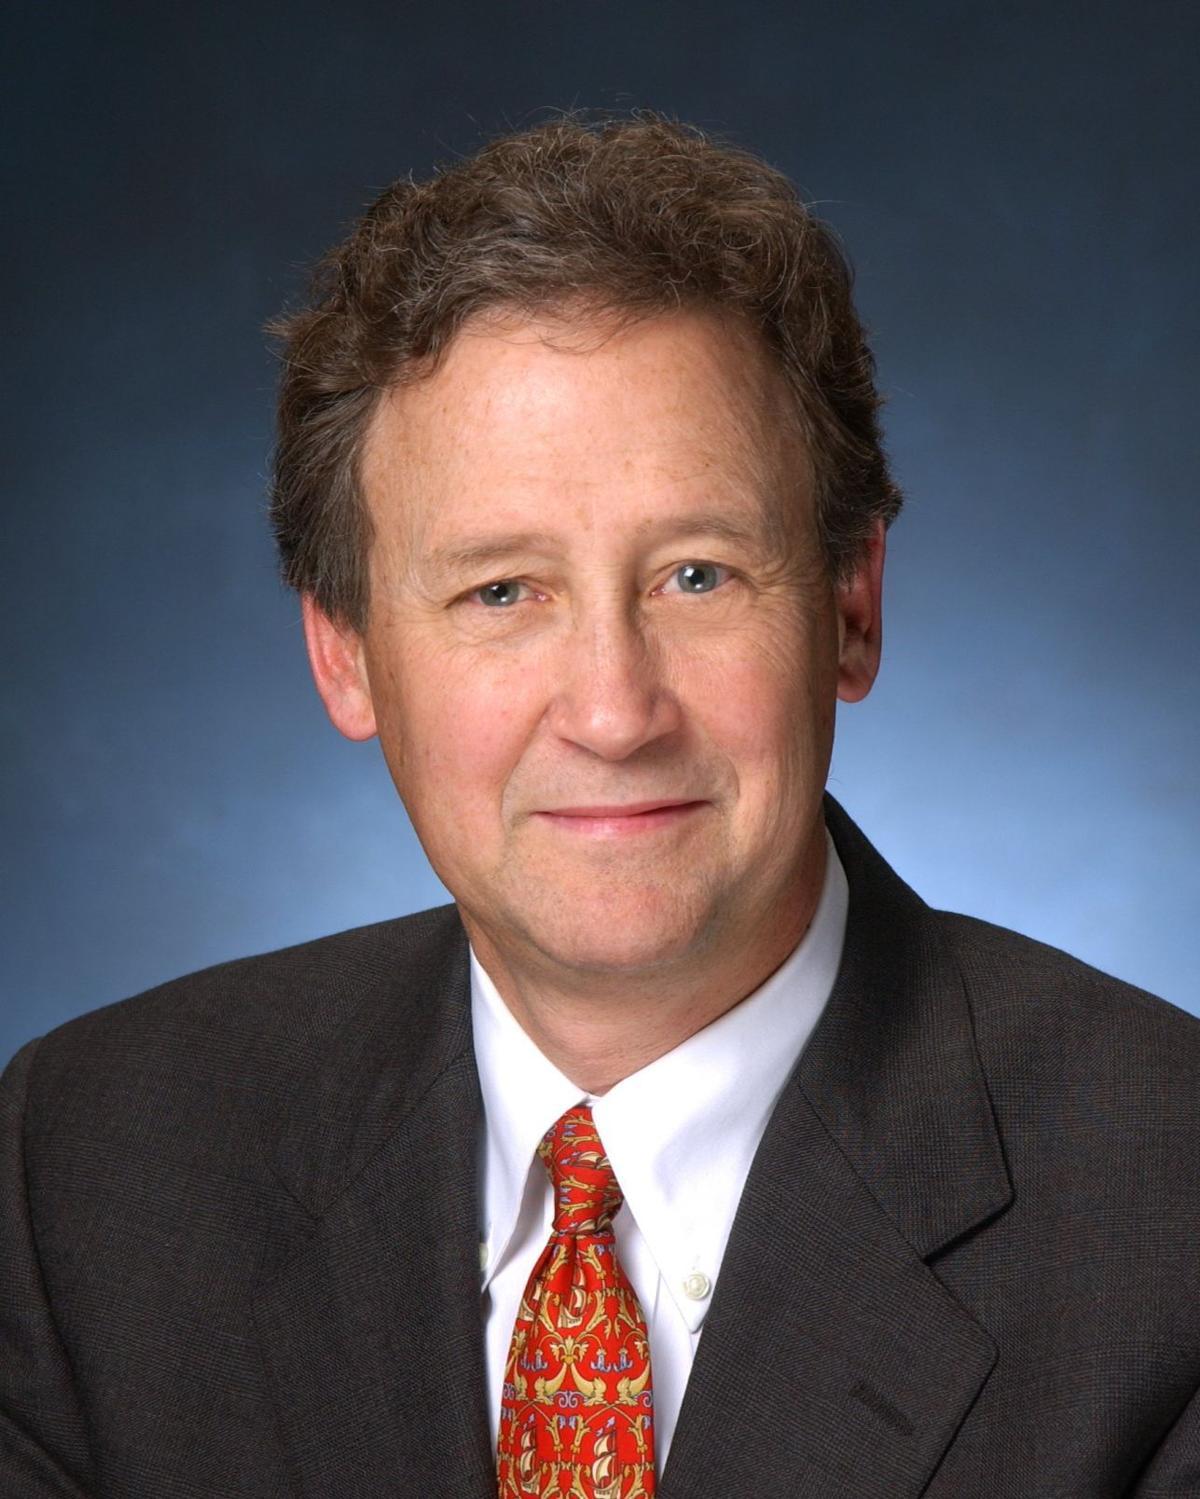 eulich takes chair at enterprise financial business com john s eulich non executive chairman of the board at enterprise financial services corp